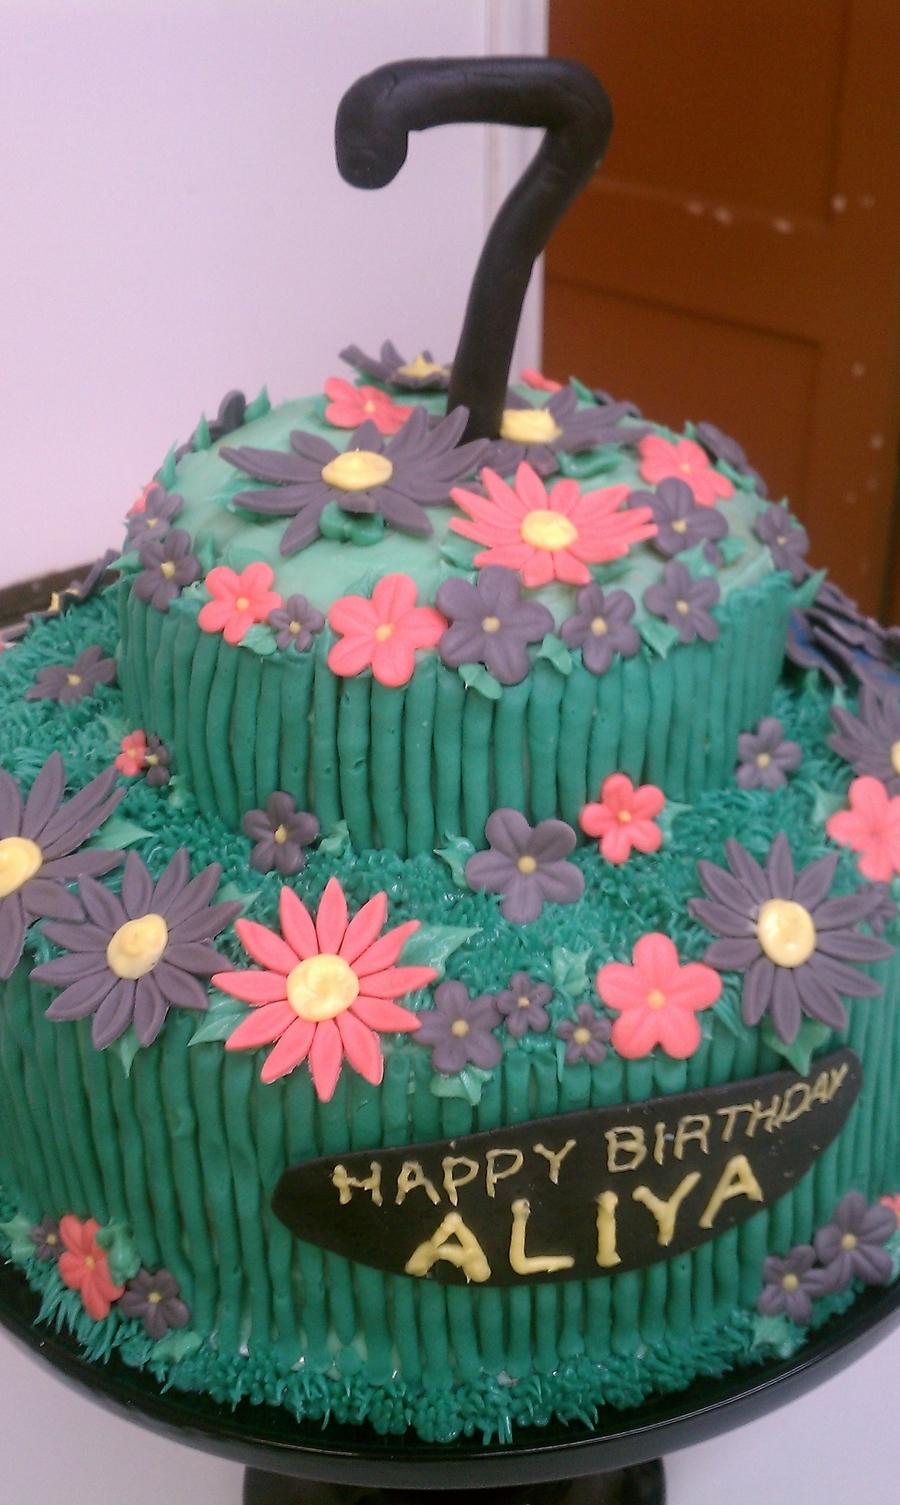 Flower garden birthday cake cakecentral flower garden birthday cake on cake central izmirmasajfo